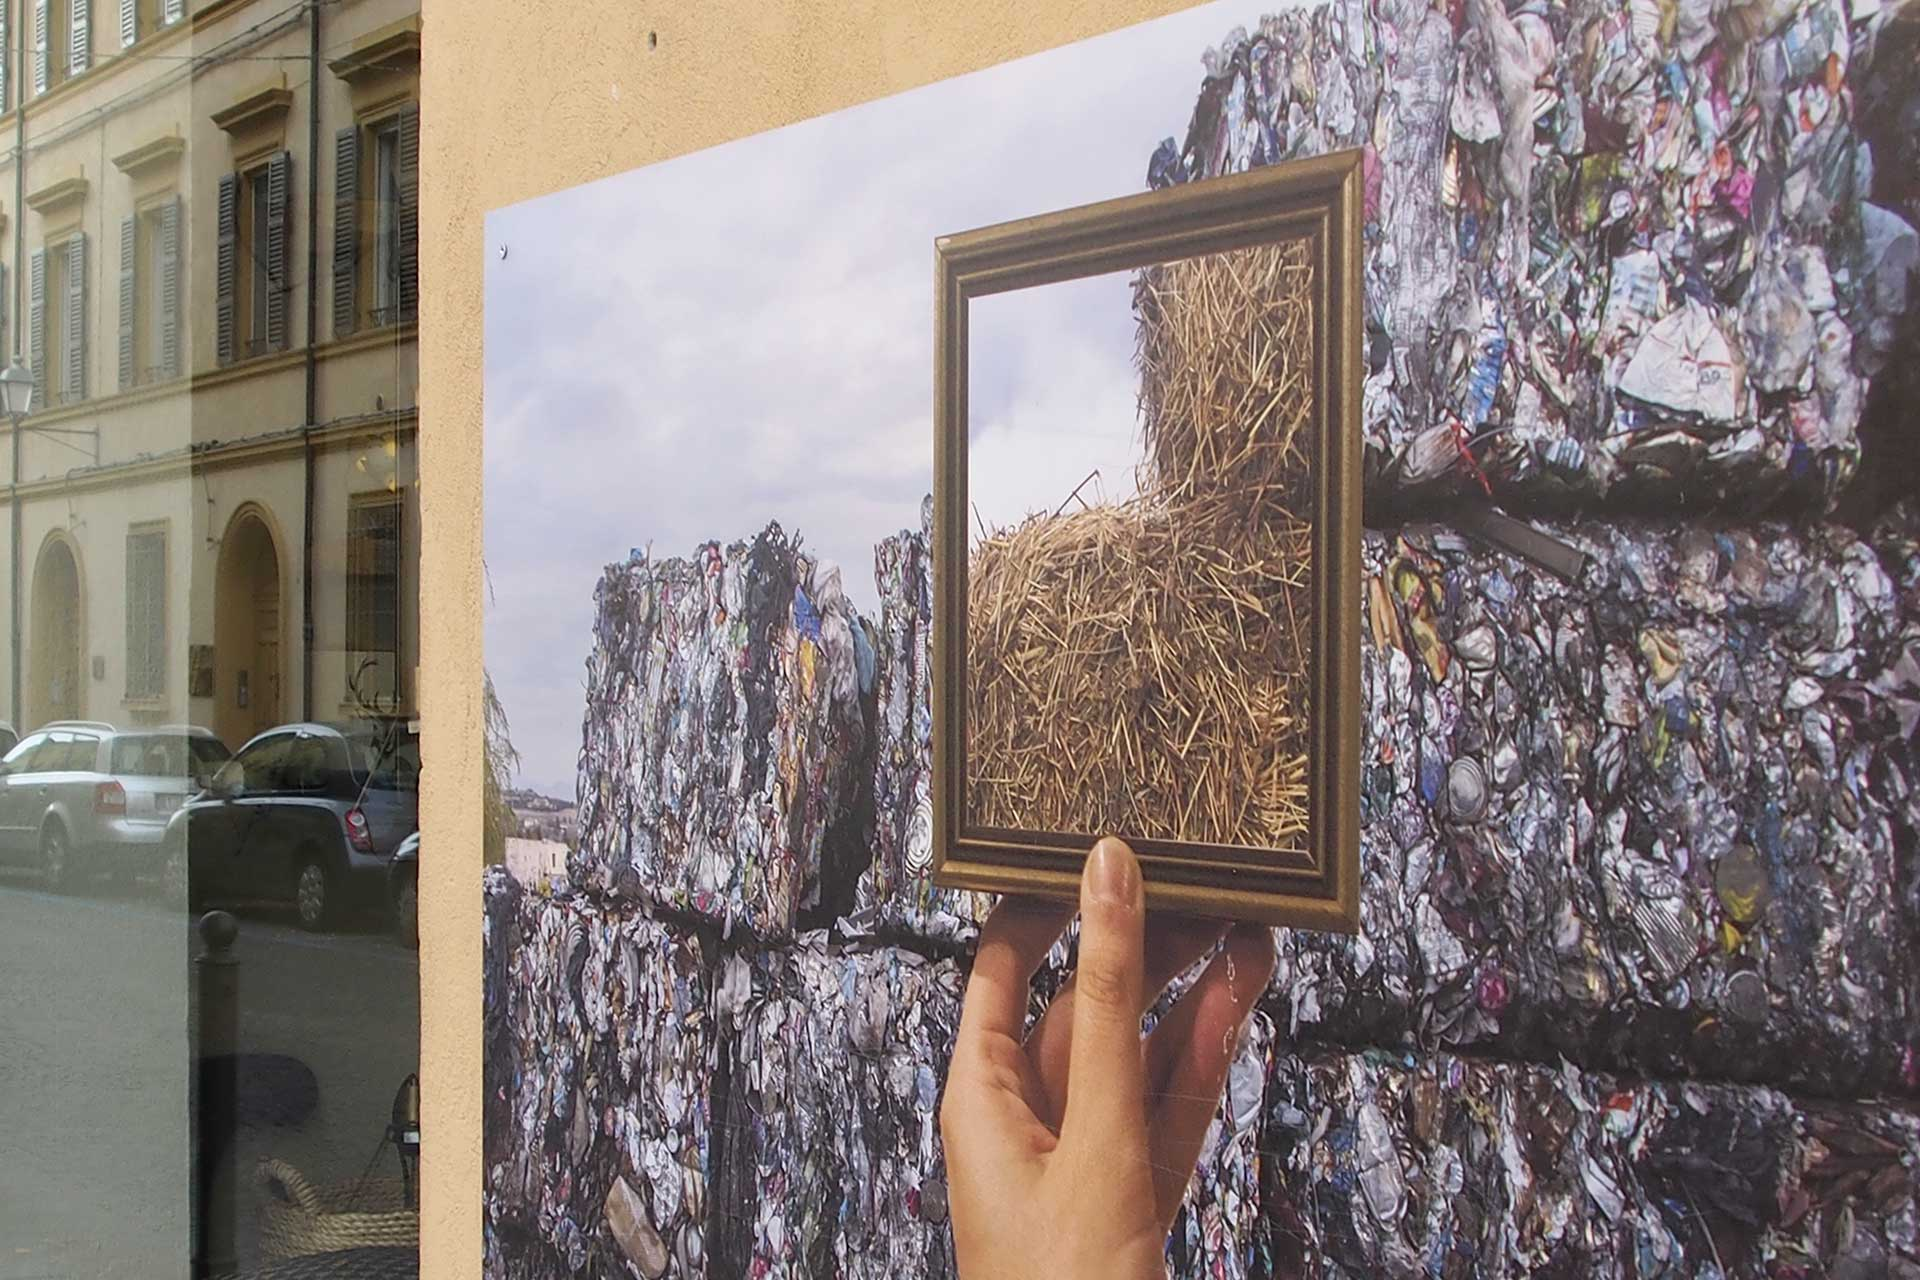 dipinto sul muro a forlì, via regoli